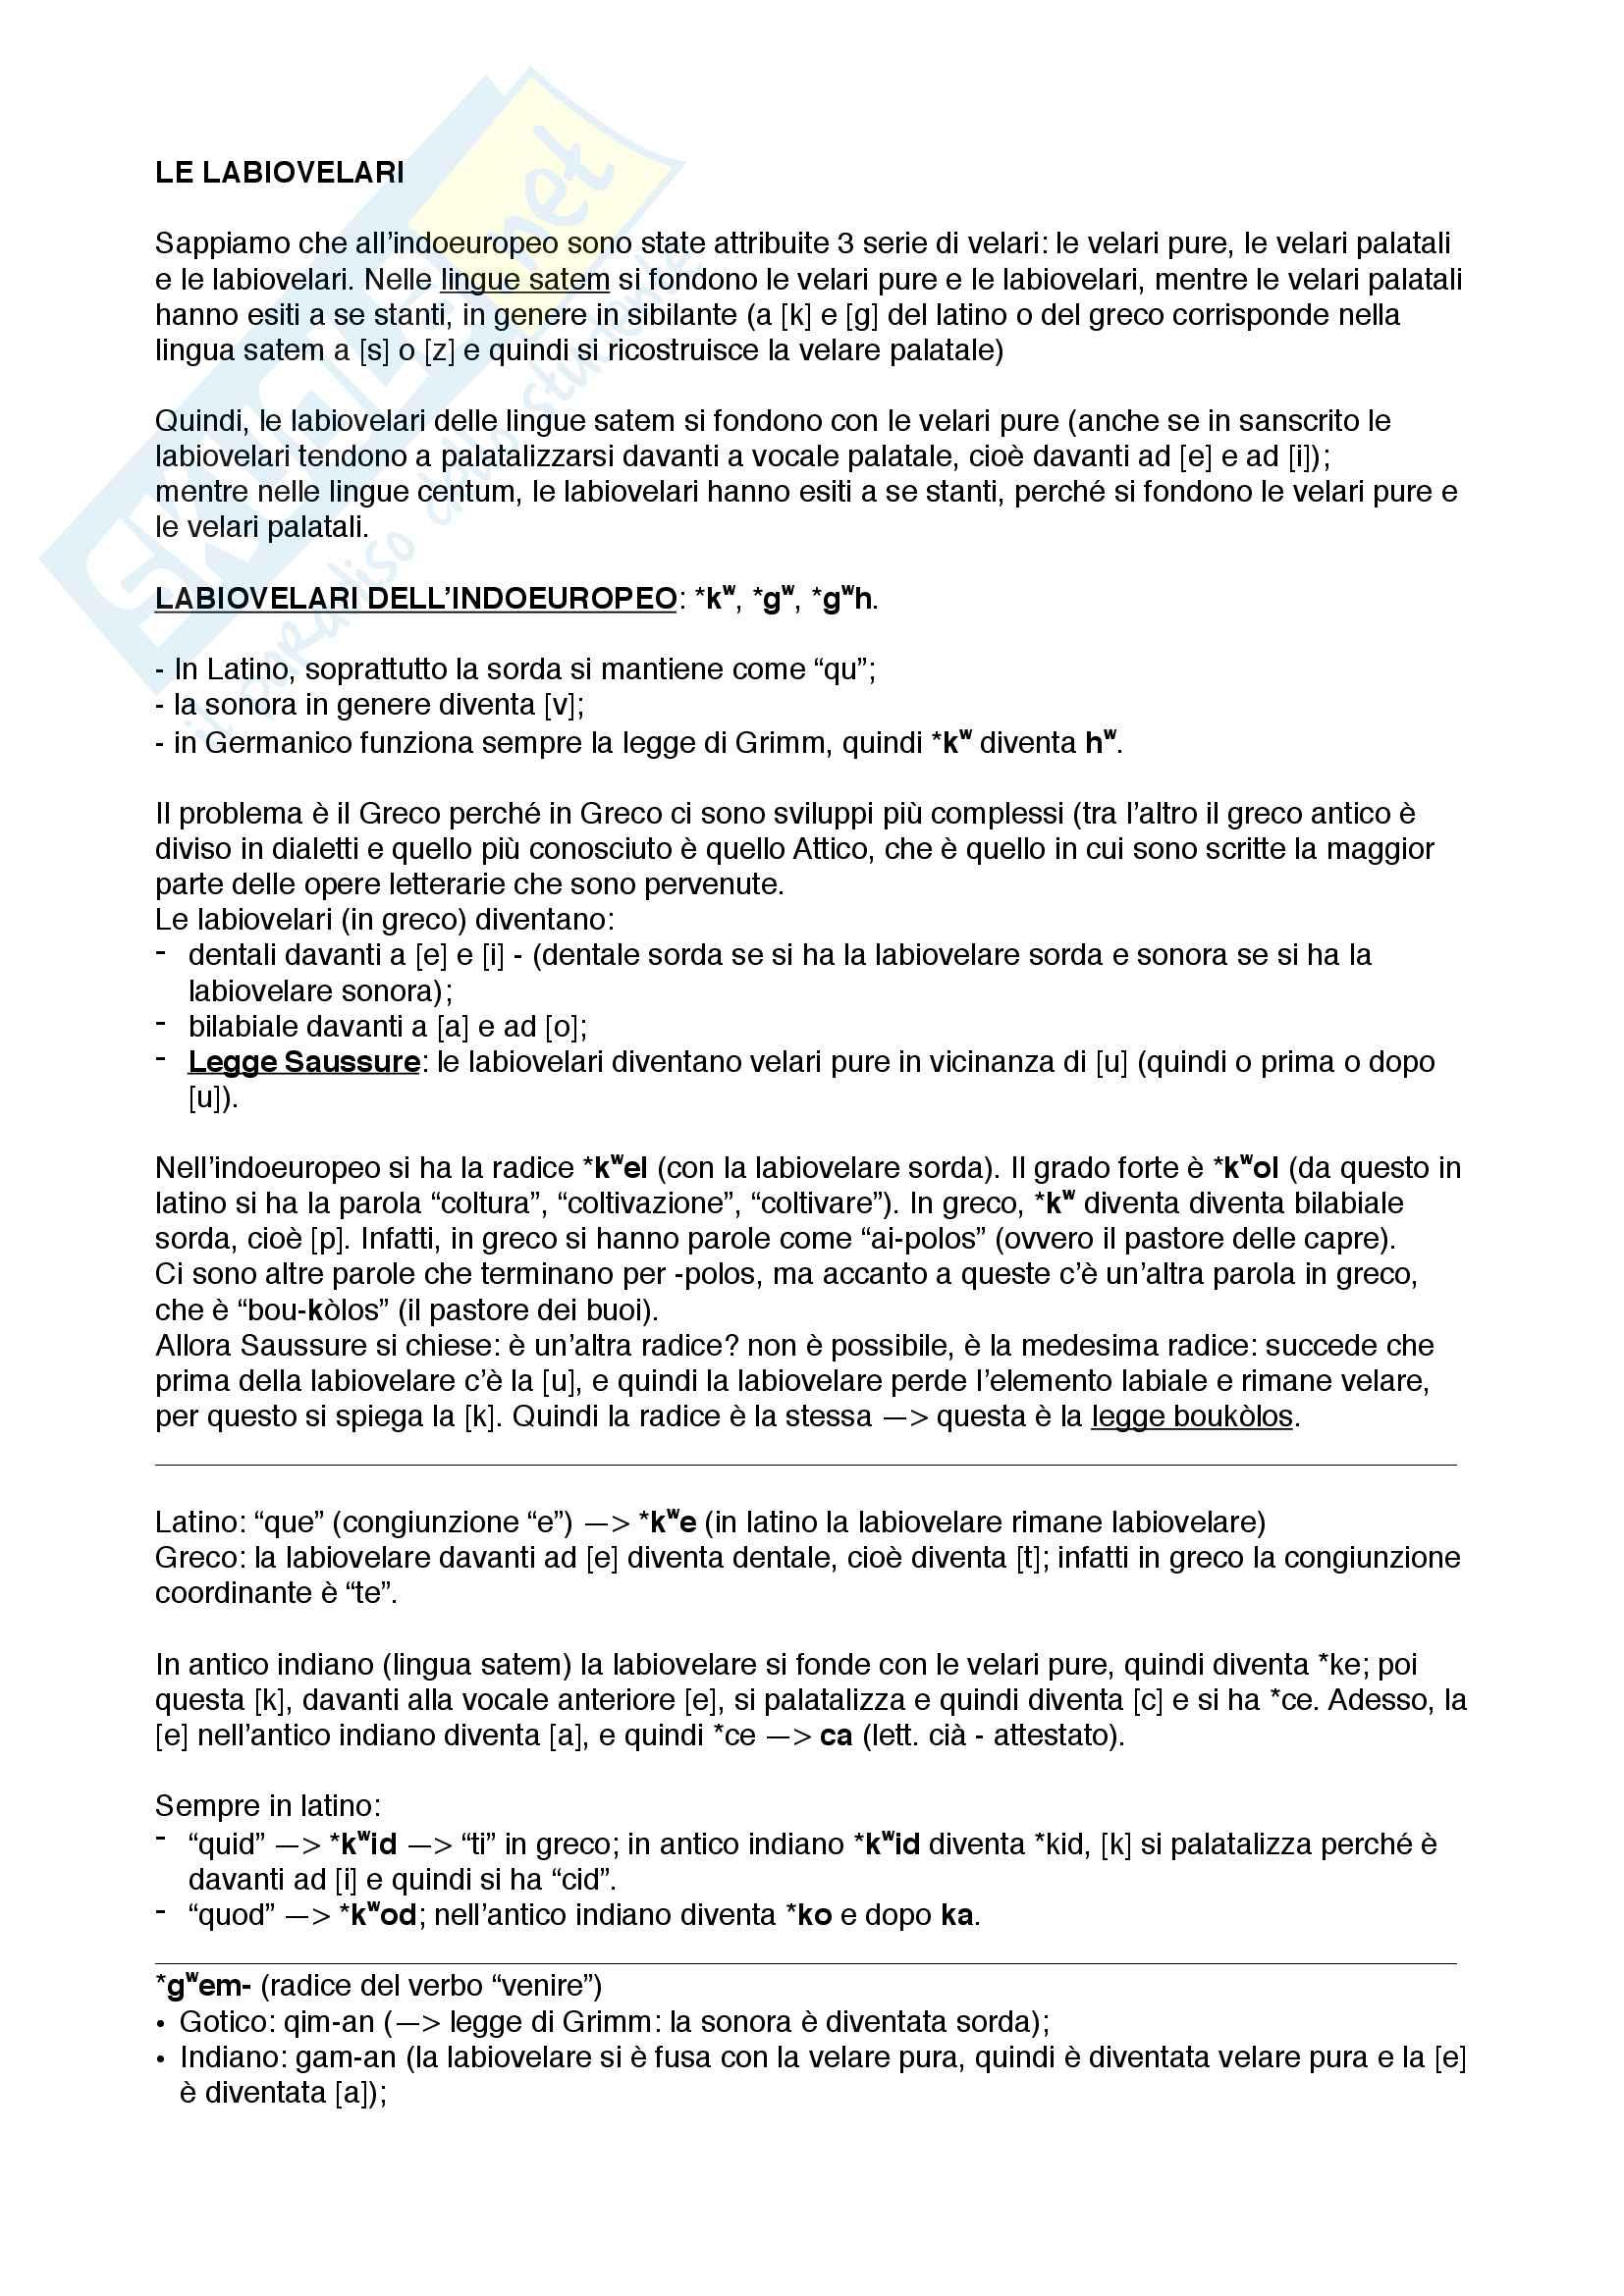 Linguistica storica 6 - Le labiovelari e teoria glottidale